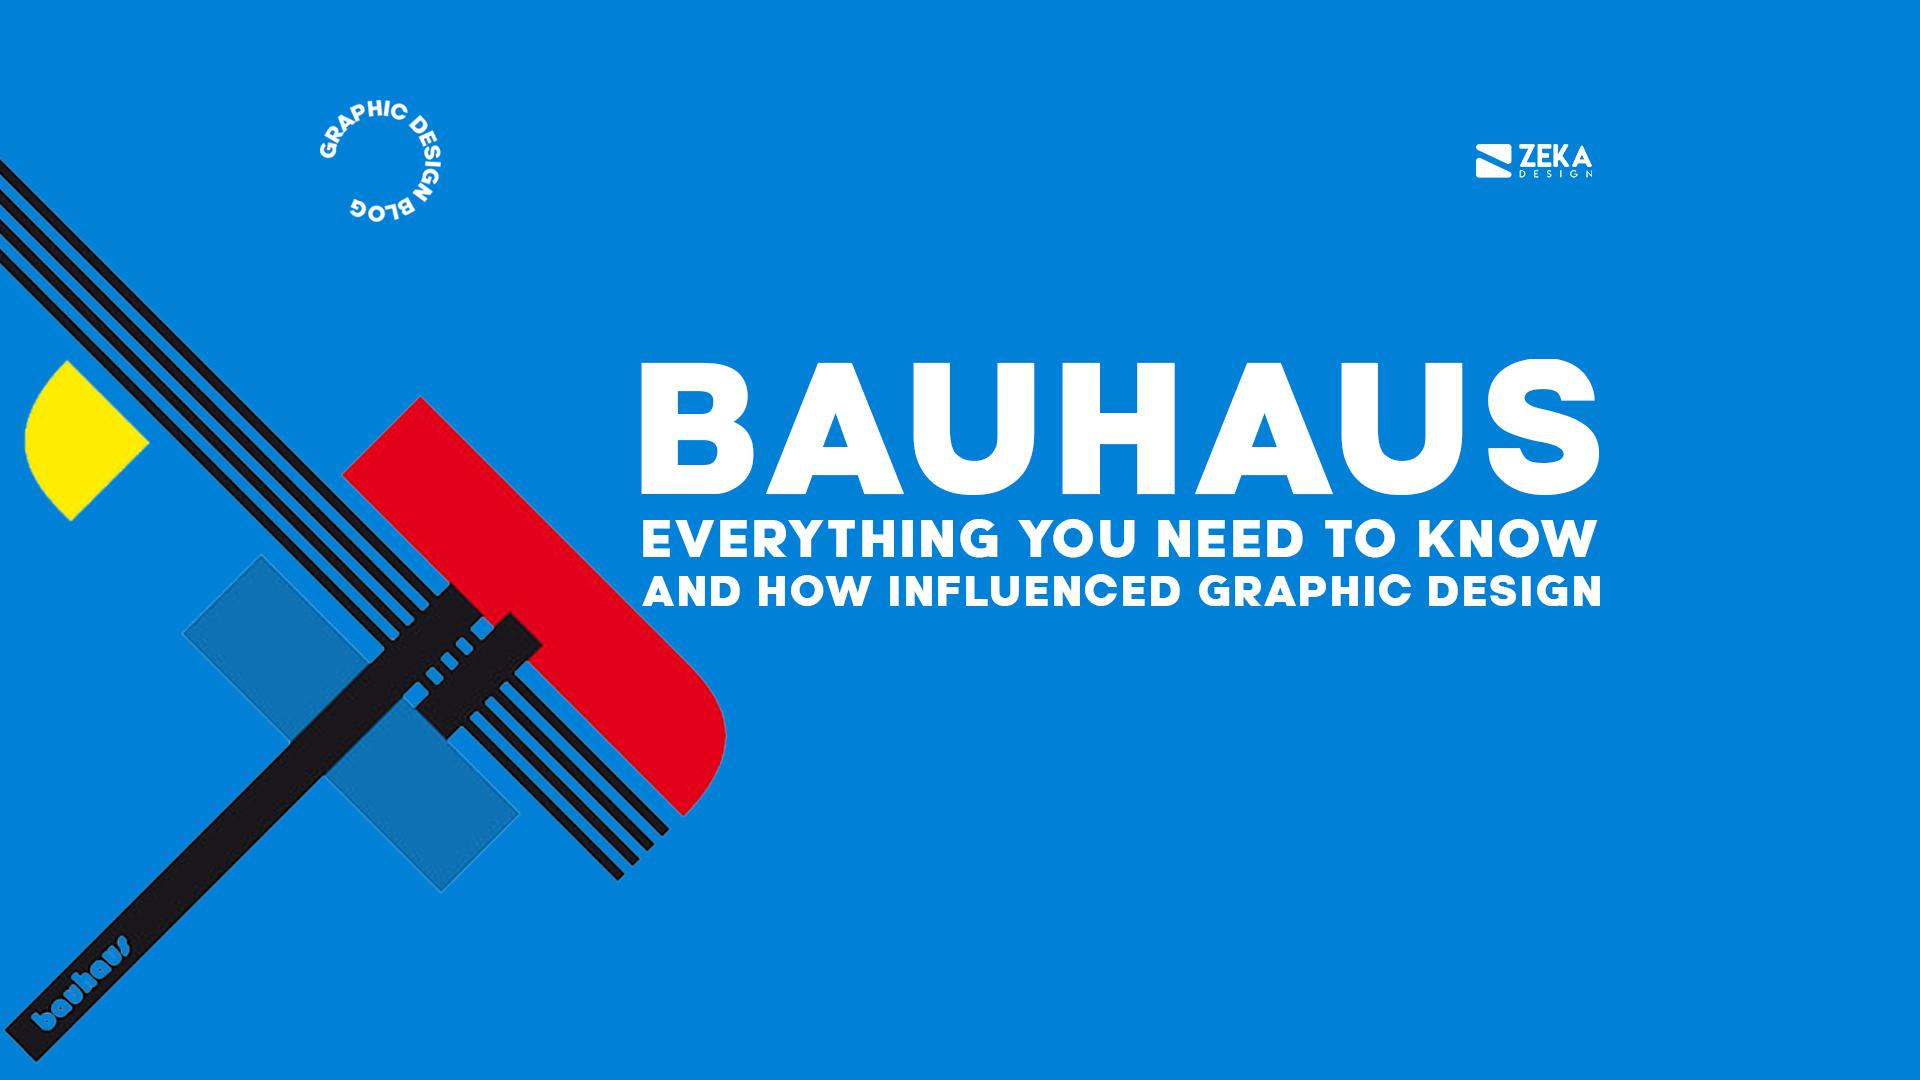 What is Bauhaus Art Design Movement in Graphic Design